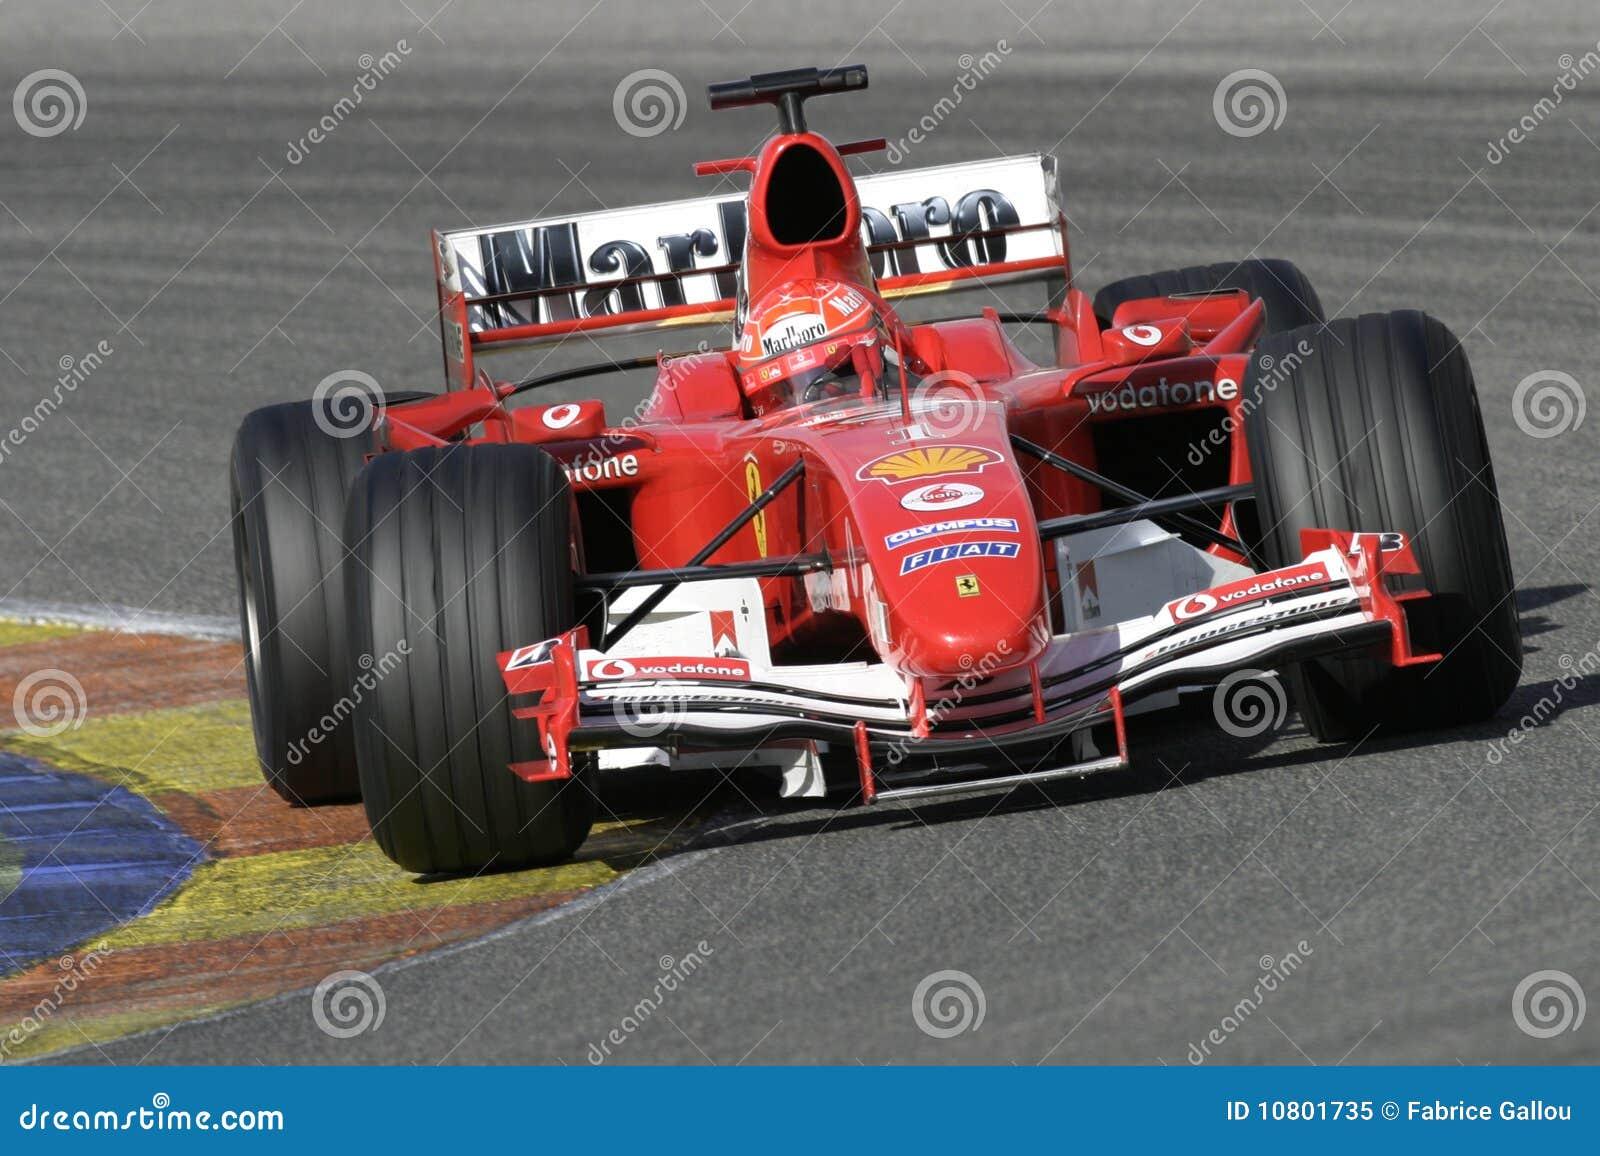 F1 2005 Michael Schumacher Ferrari Redaktionelles Bild Bild Von Auto Ferrari 10801735